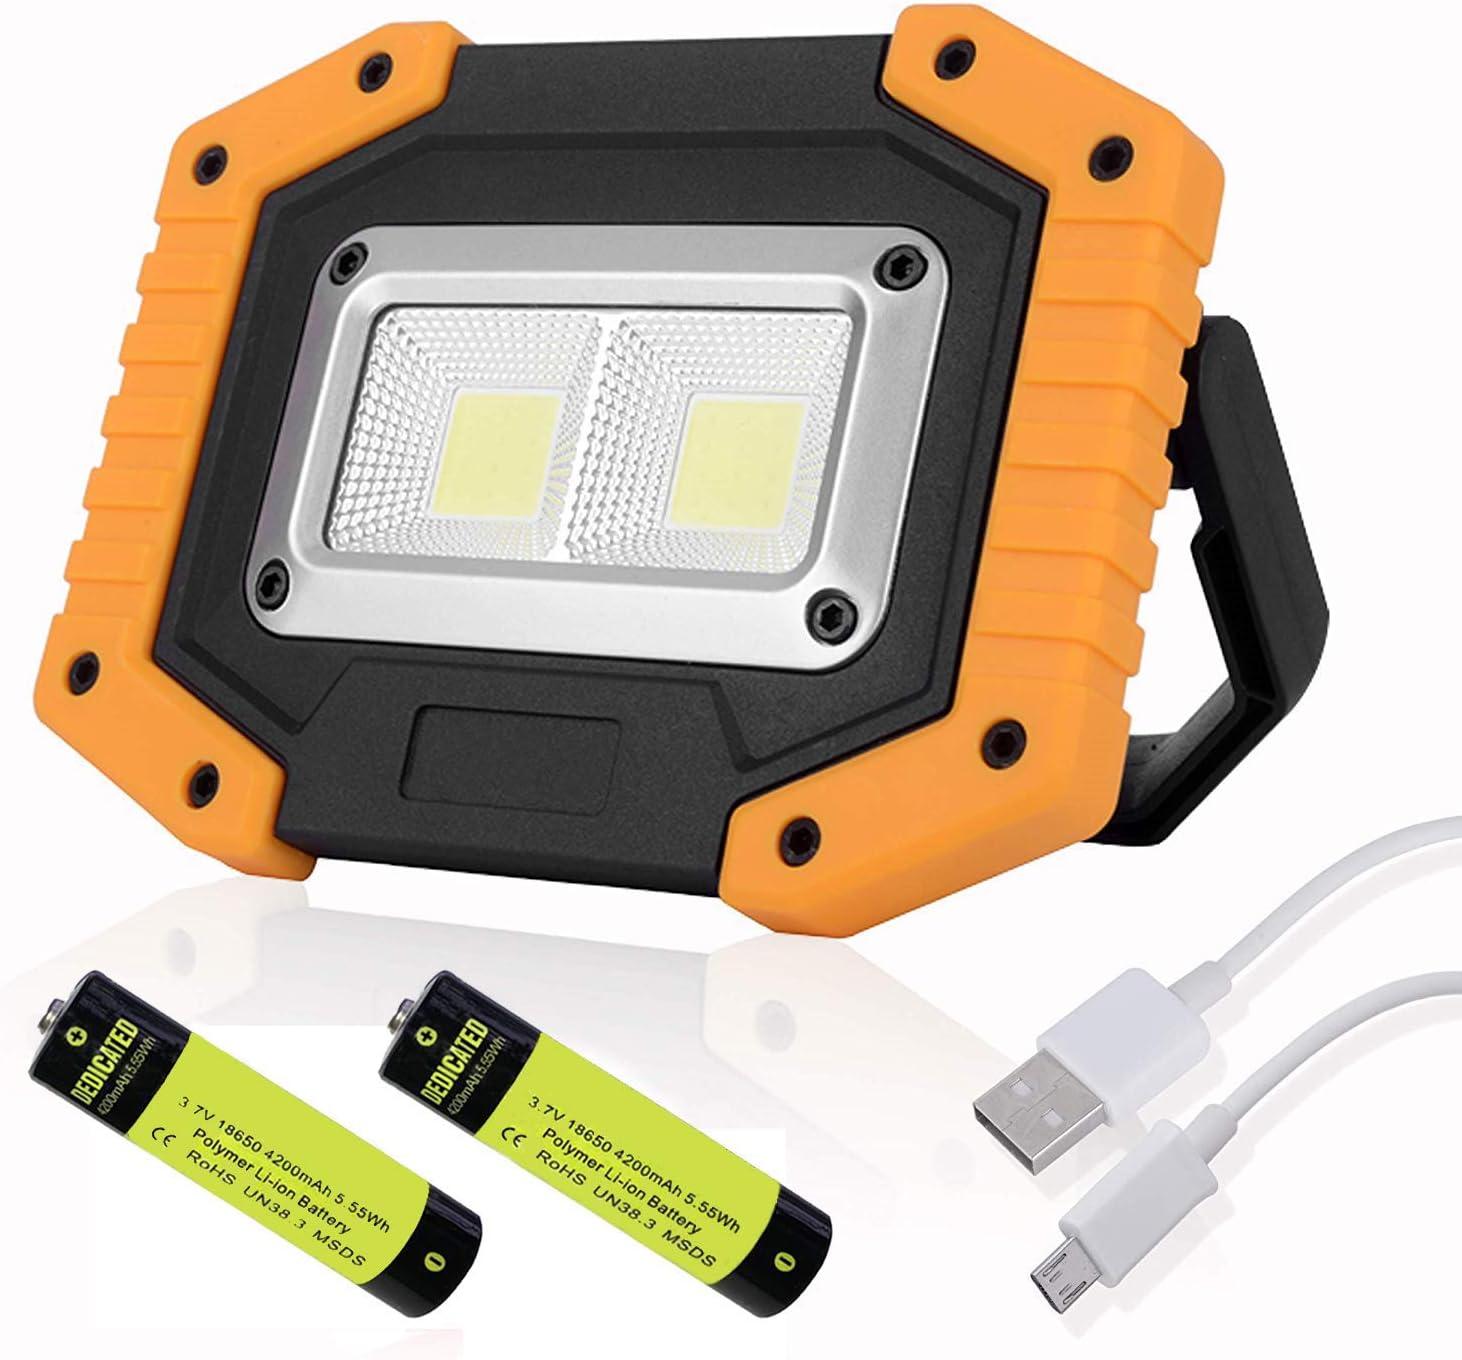 LED FLASHLIGHT AND COB FLOODLIGHT